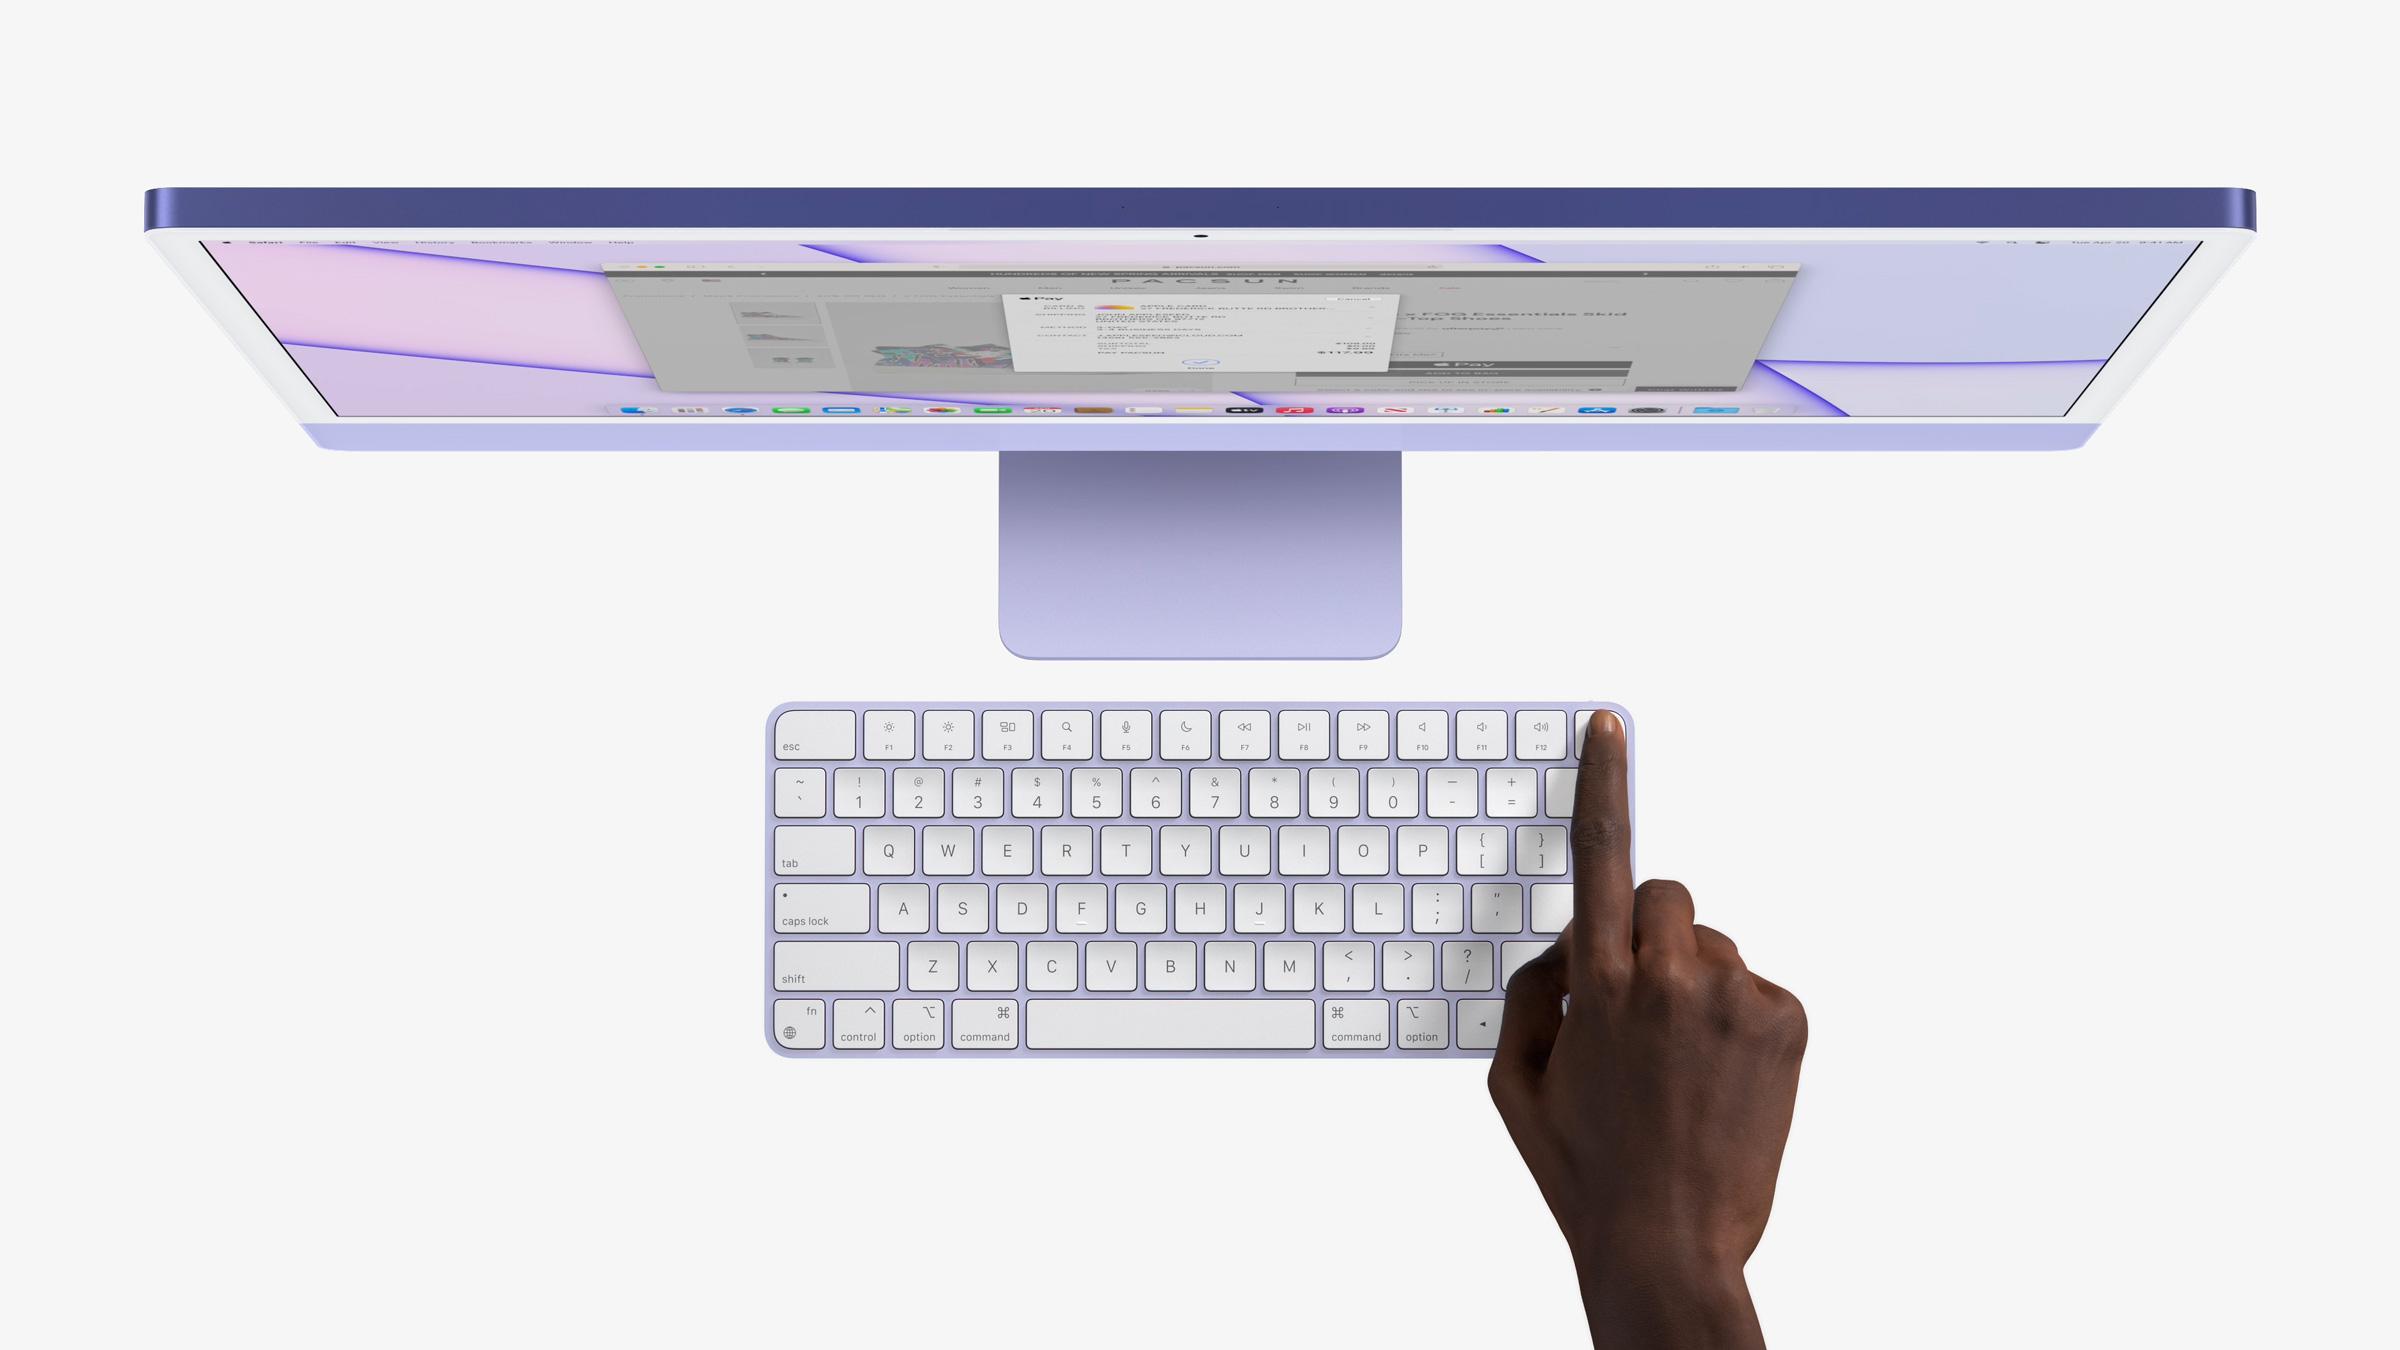 apple_new-imac-spring21_pt-purple-touch-id_04202021.jpg